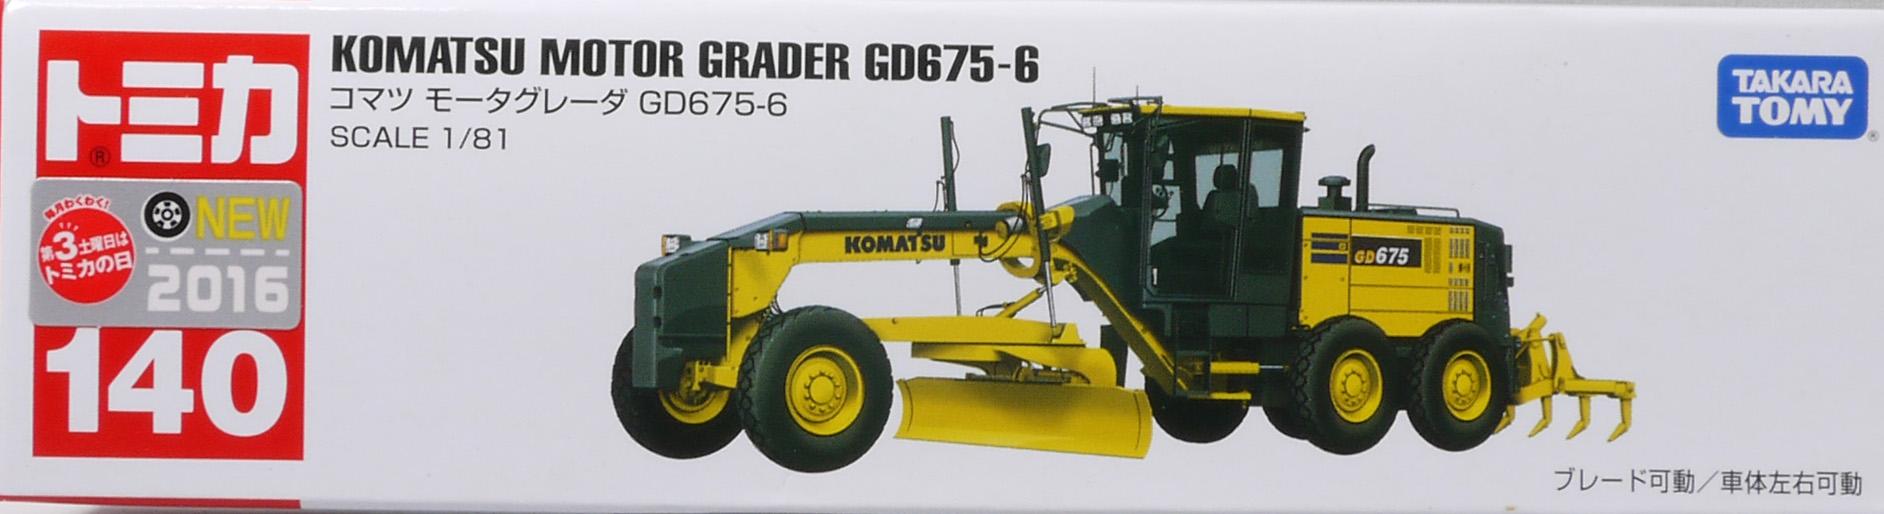 TAKARA TOMY TOMICA #140 KOMATSU NIVELEUSE AUTOMOTRICE GD675-6 1//81 Diecast Toy Car